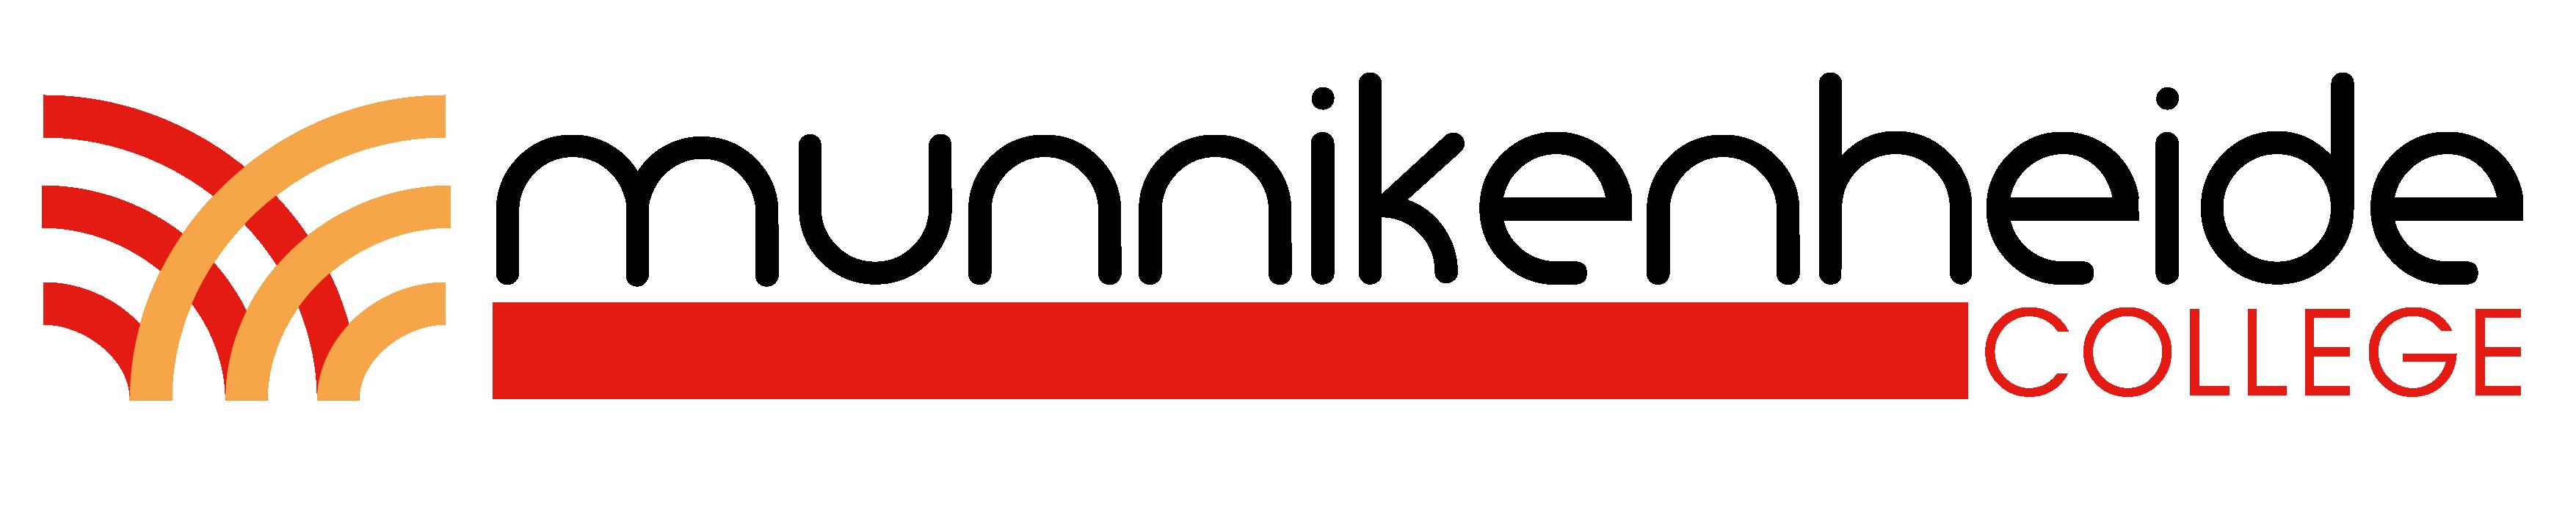 Munnikenheide College locatie Etten-Leur logo